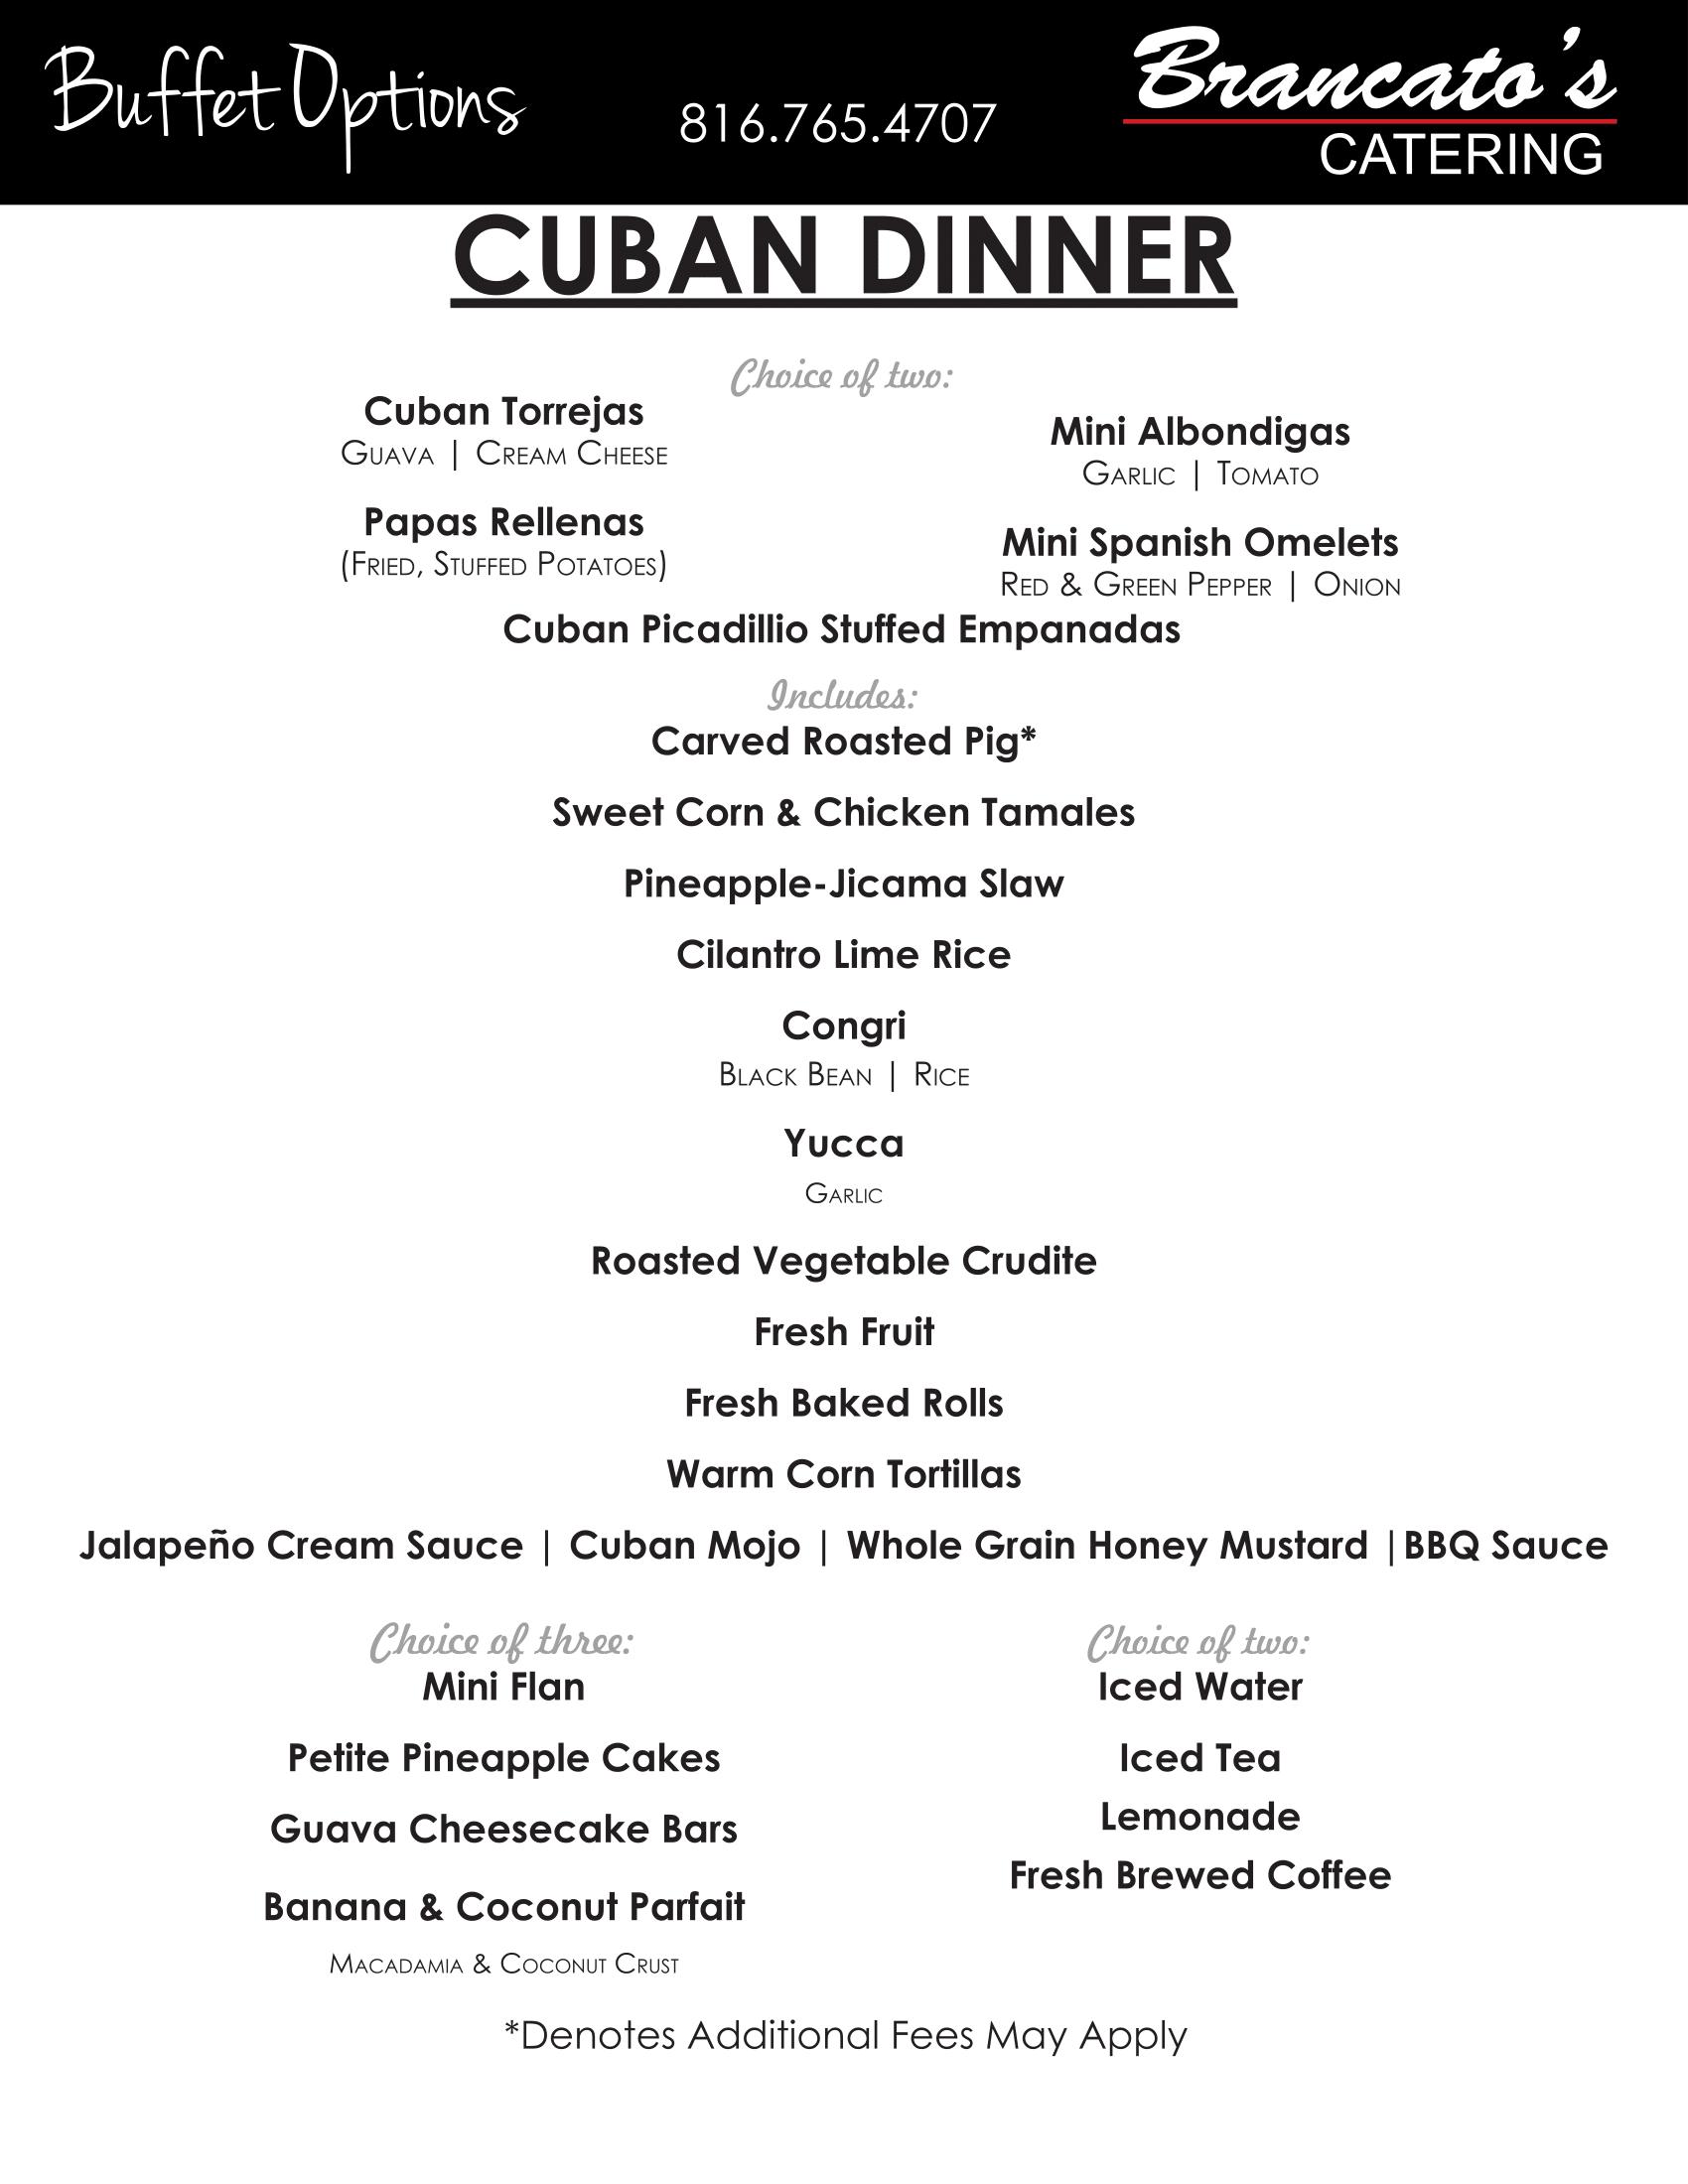 cuban dinner-1